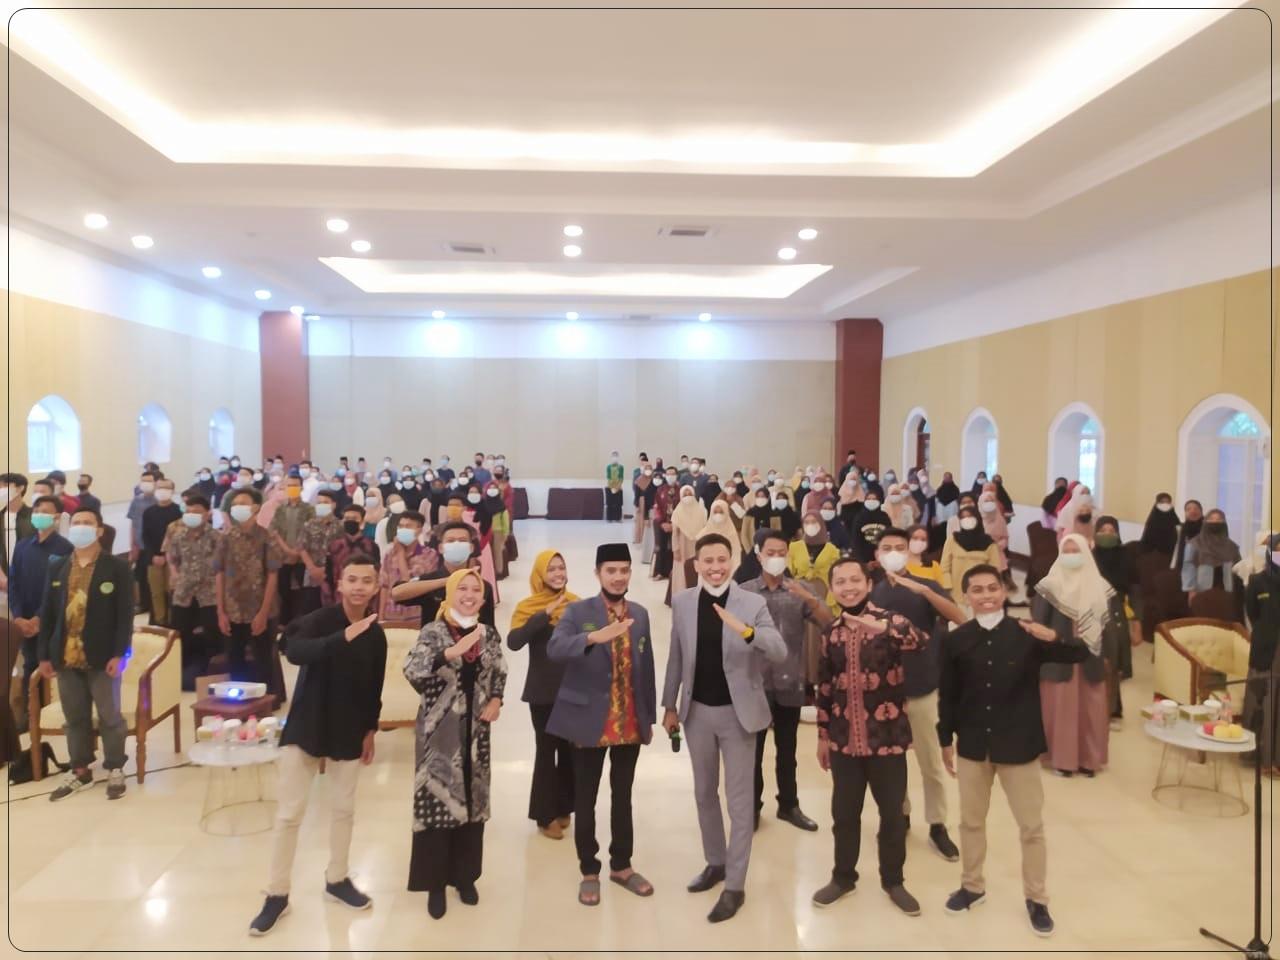 Songsong Pasca Pandemi, Pelajar NU Kebumen Gelar Seminar Kewirausahaan